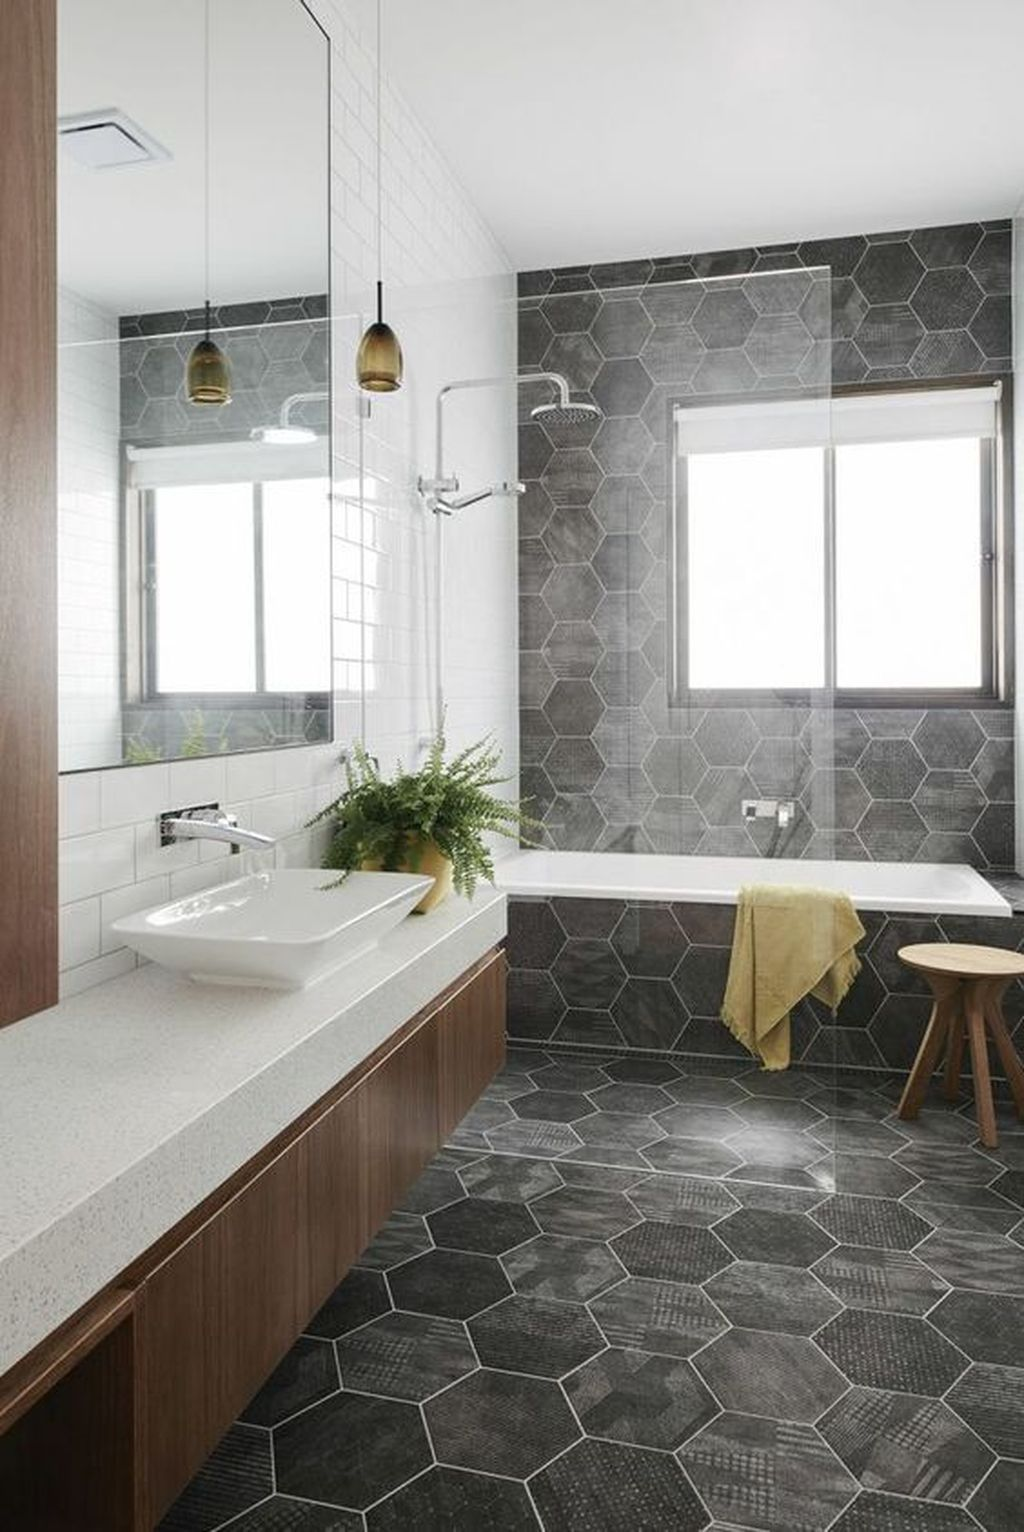 36 Amazing Bathroom Tile Ideas To Beautify Your Bathroom Best Bathroom Flooring Bathroom Interior Design Bathroom Design Decorating ideas bathroom flooring